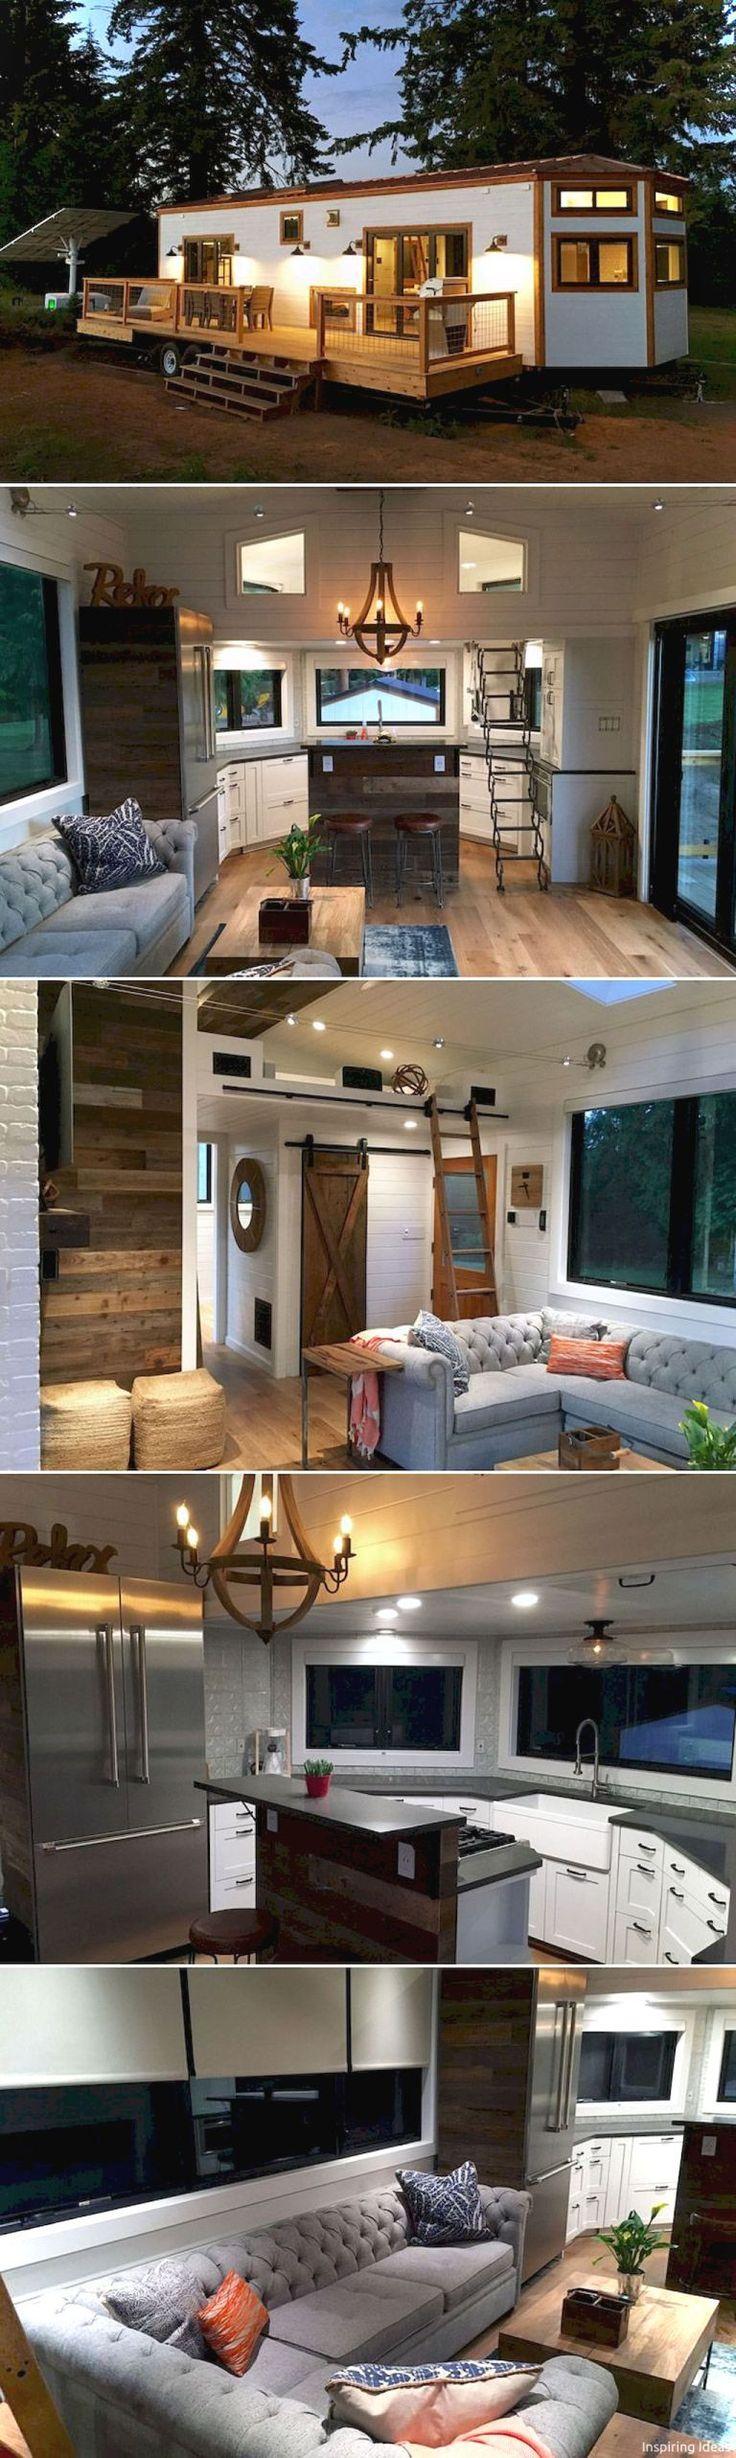 23 awesome tiny house interior ideas 311